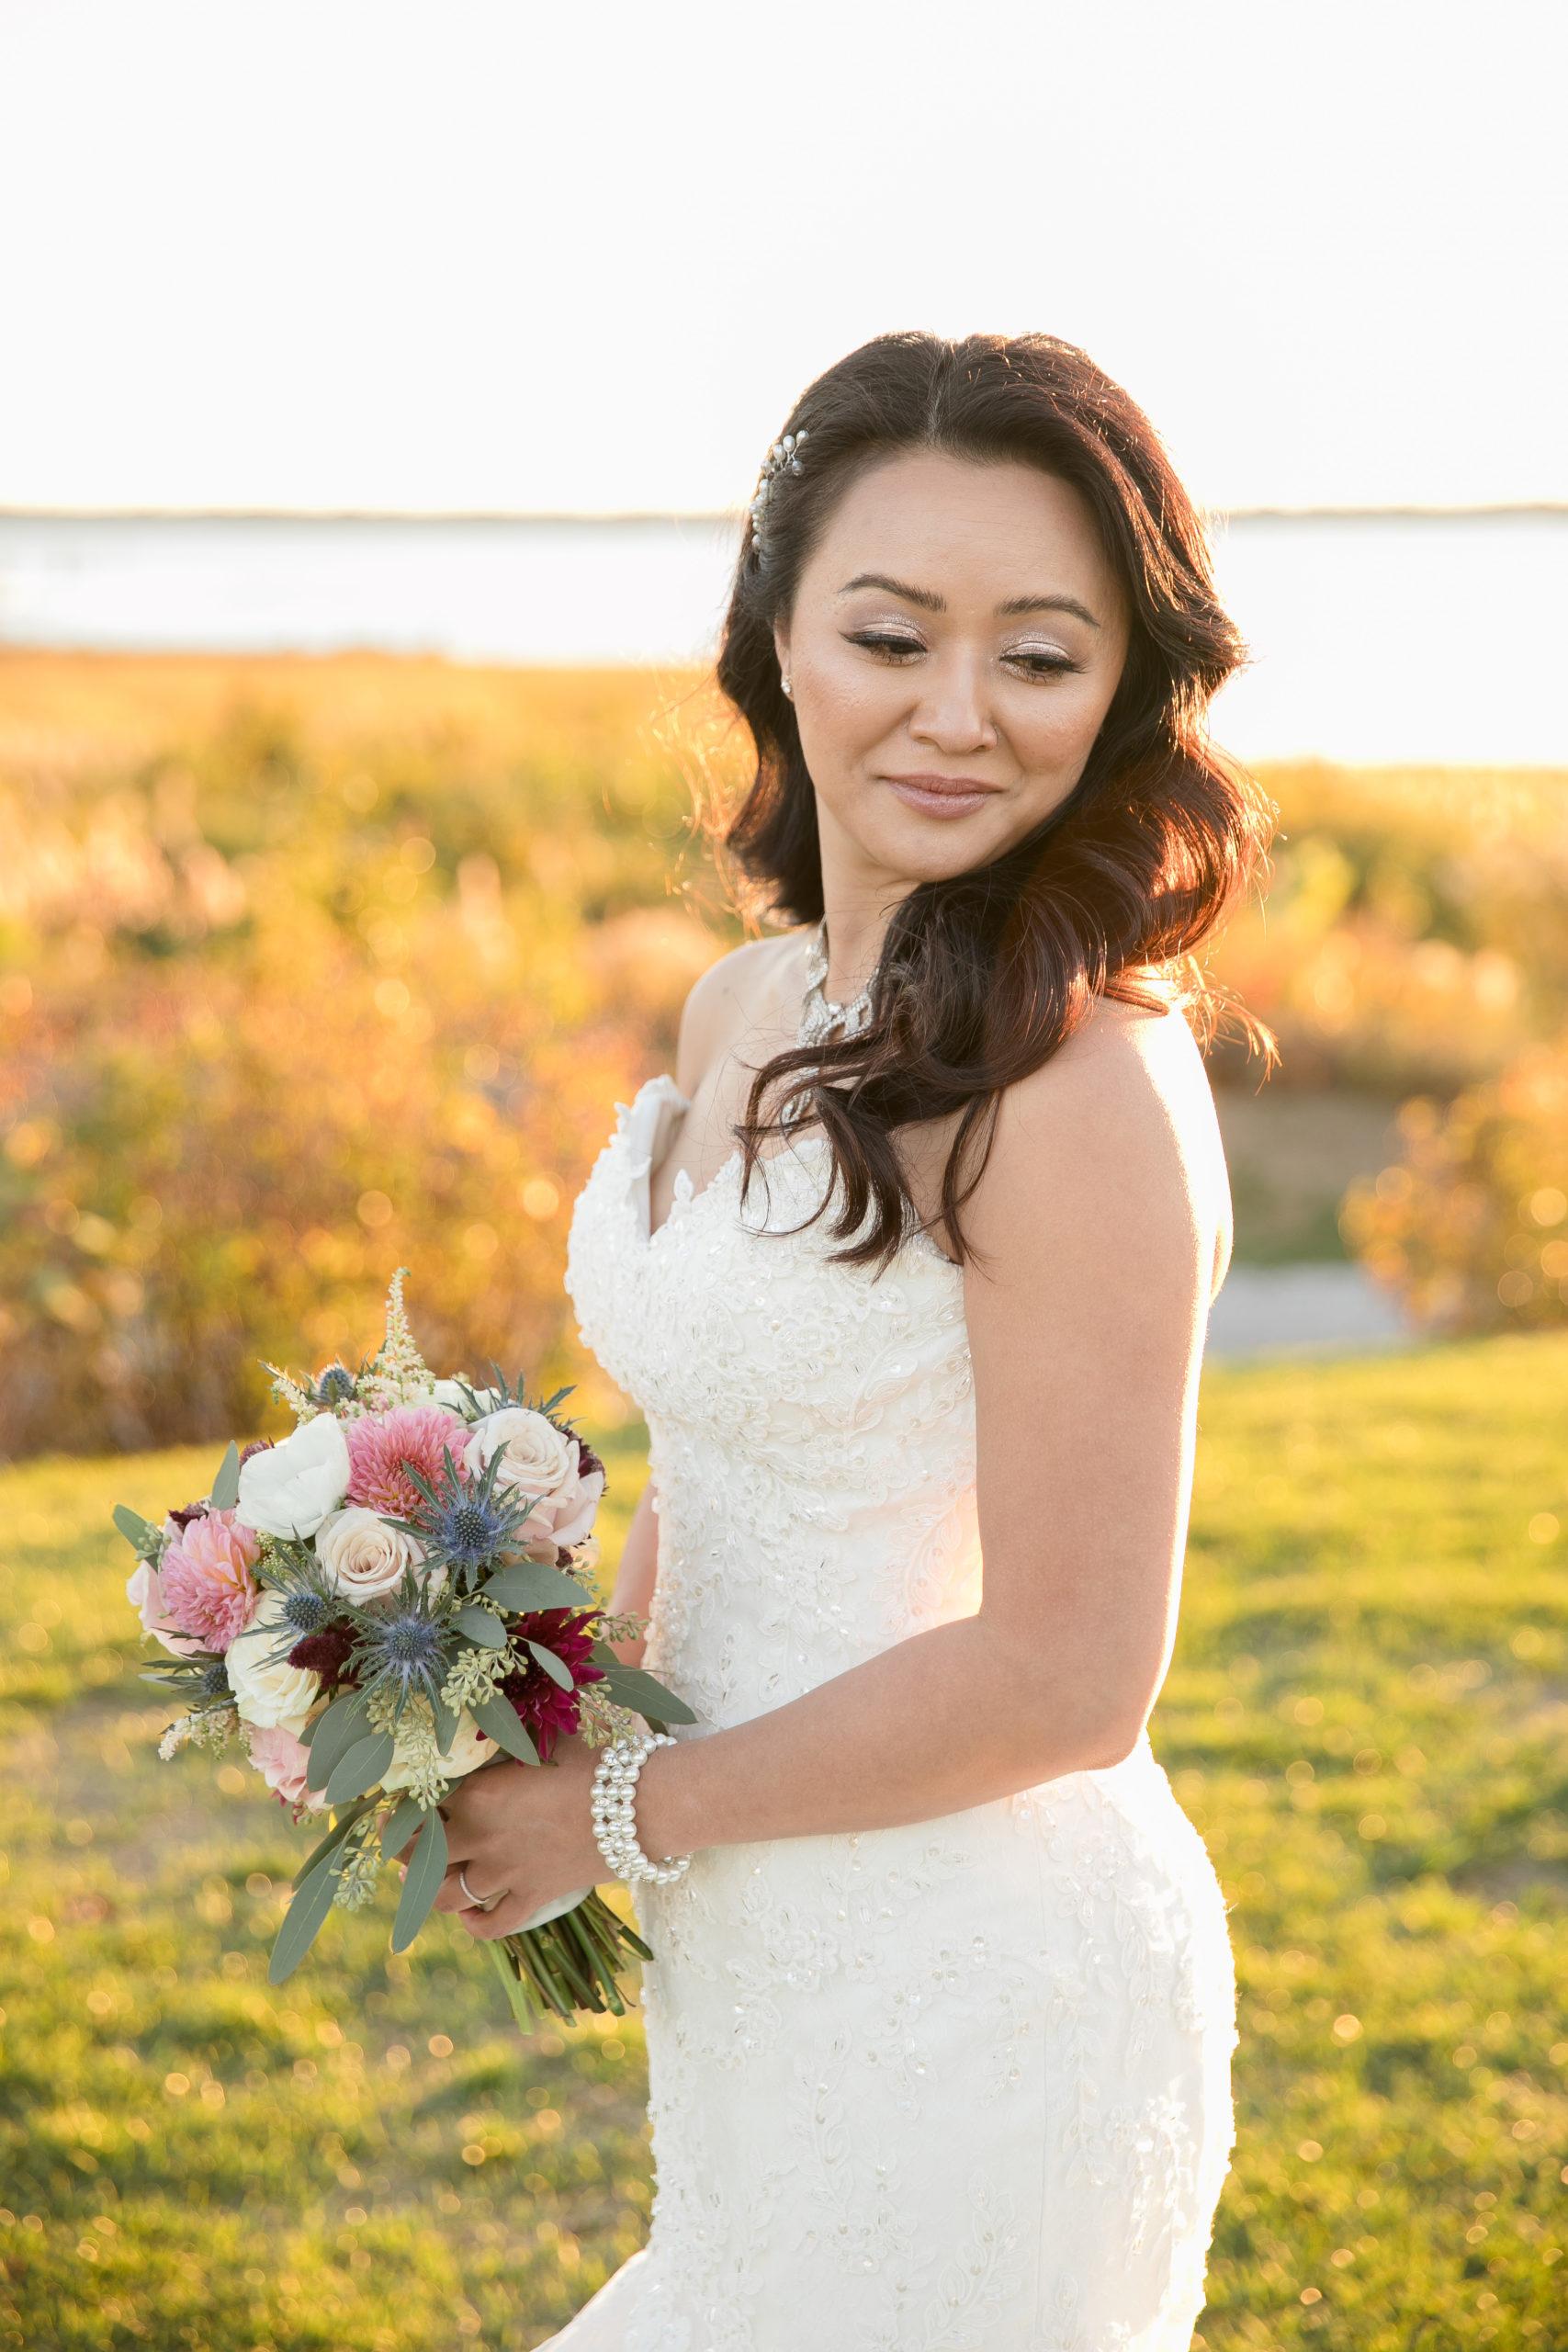 Harbor lights, warwick, rhode island, RI, Tracy Jenkins Photography, RI wedding photographer, Rhode Island wedding photographer, micro-wedding, bride, bridal portrait